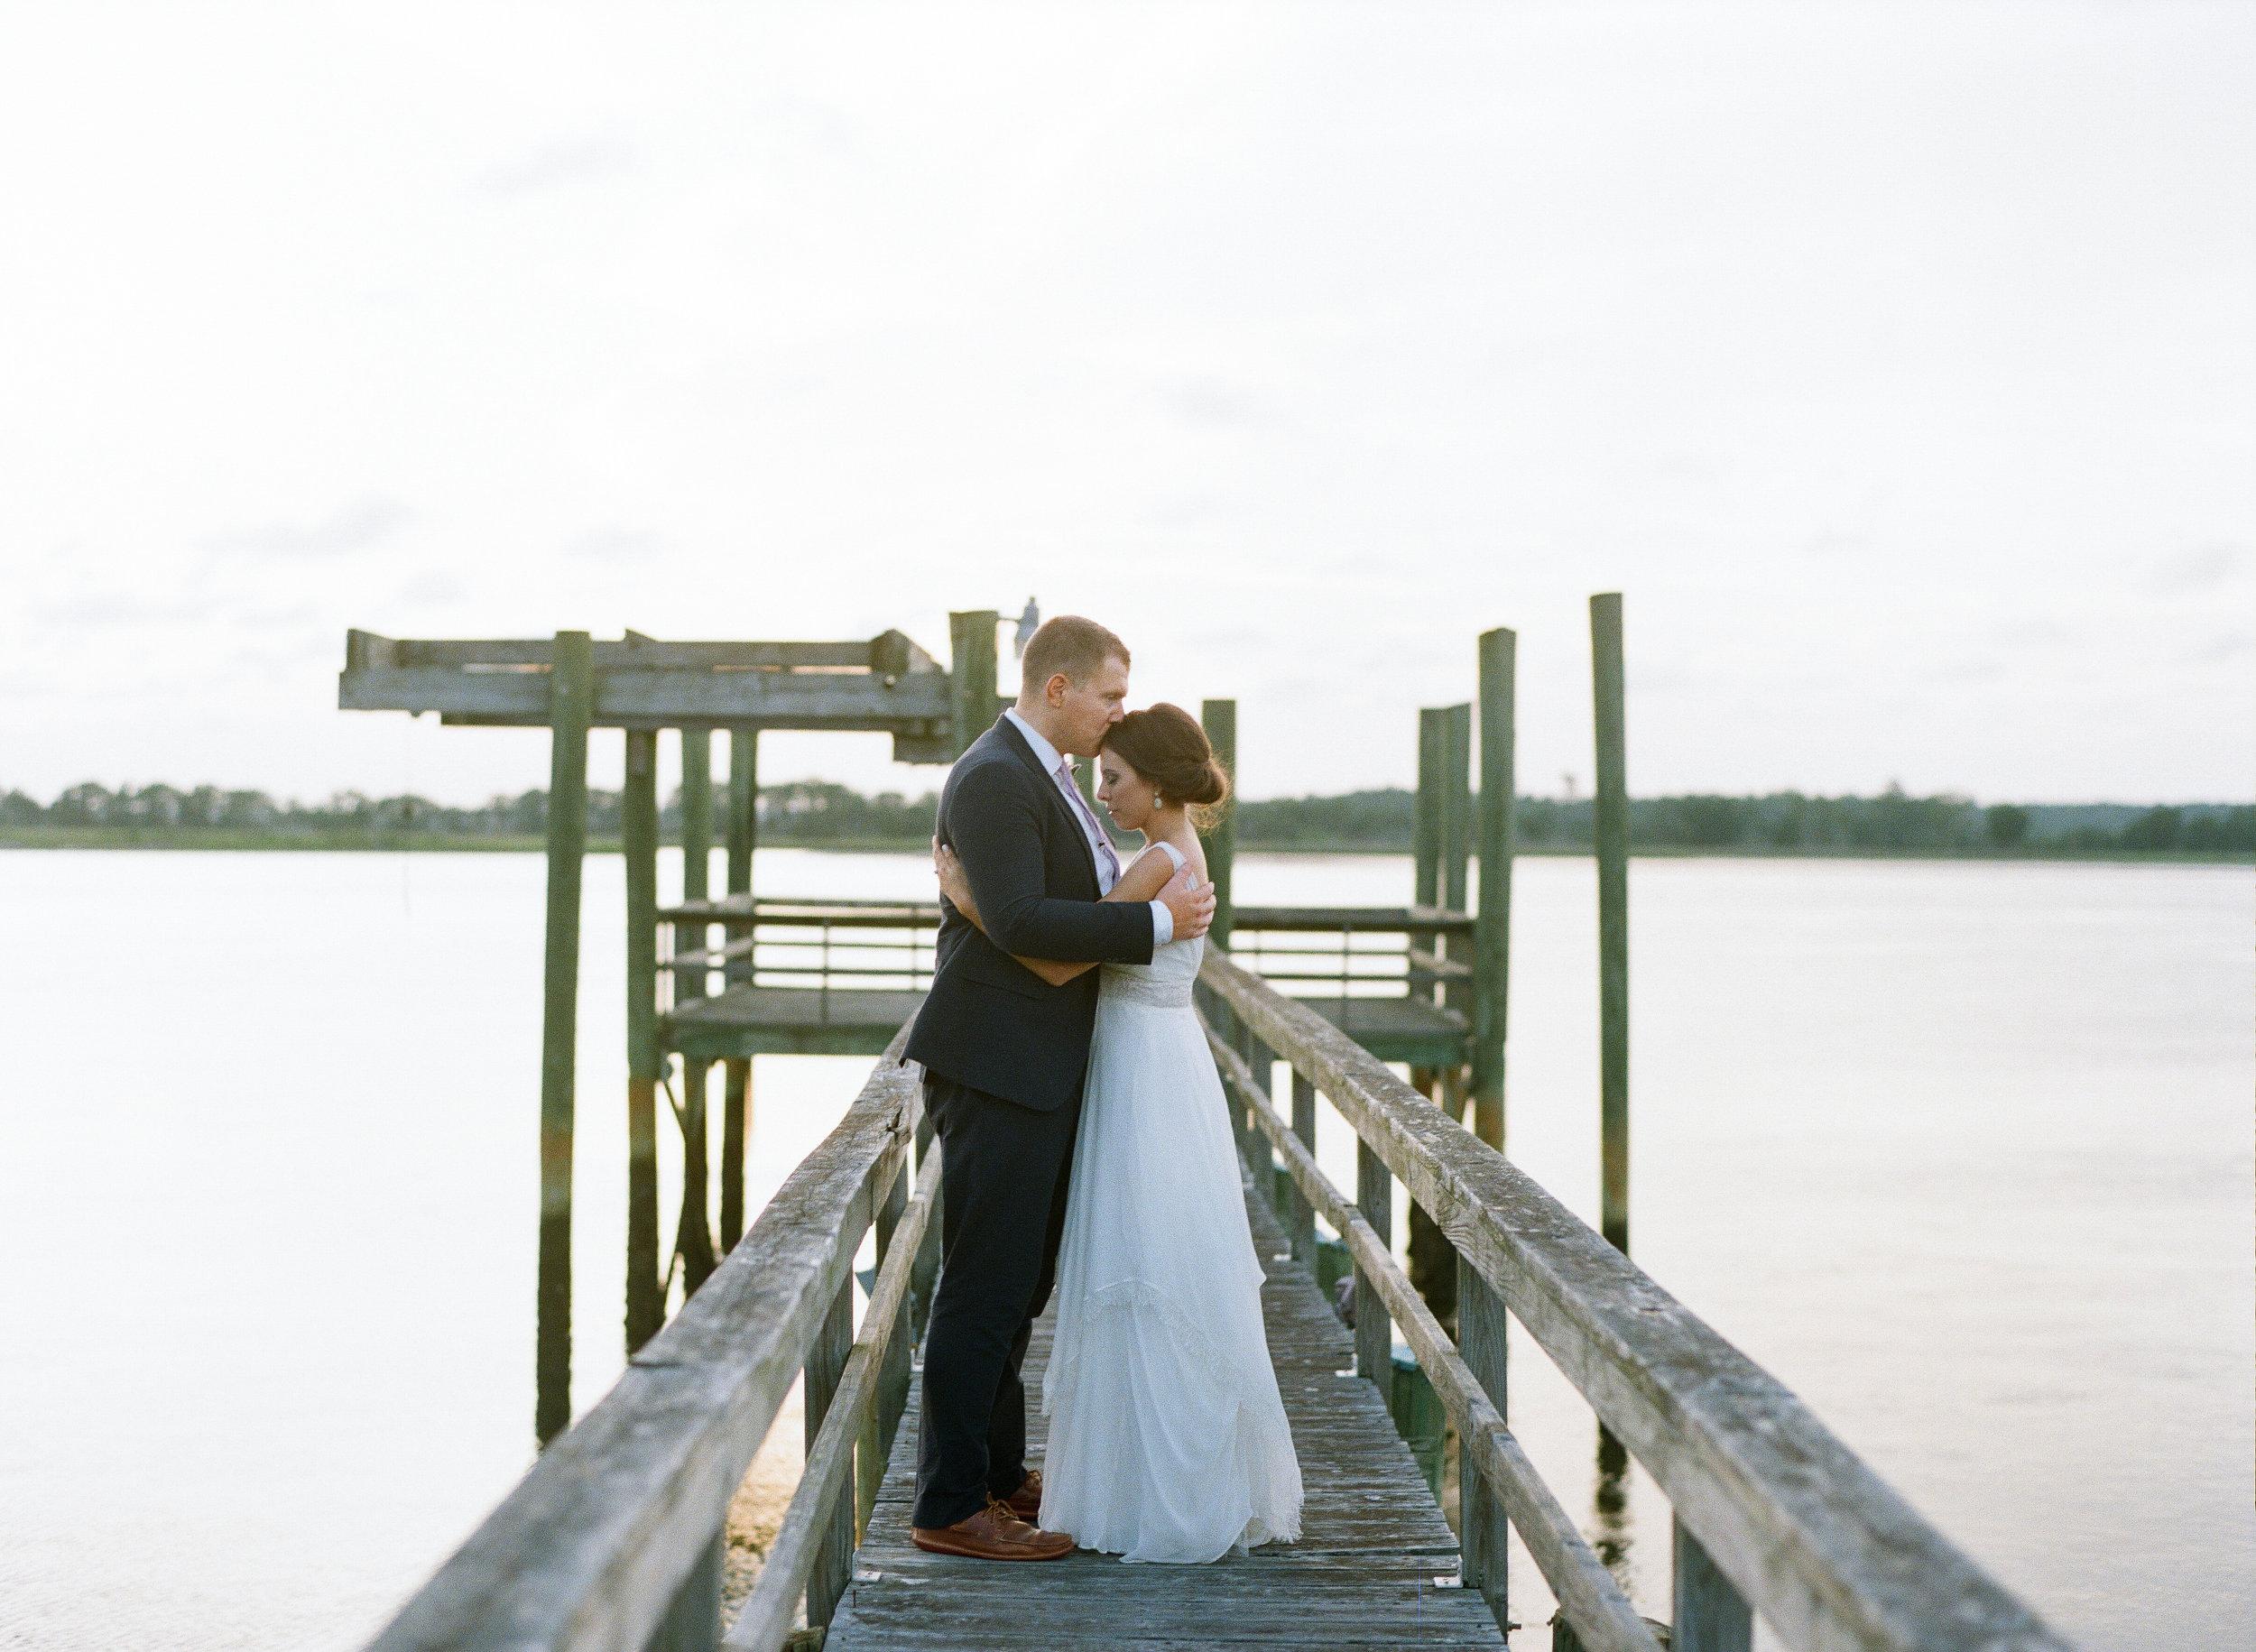 Addy & Will's Island House wedding on Johns Island, South Carolina